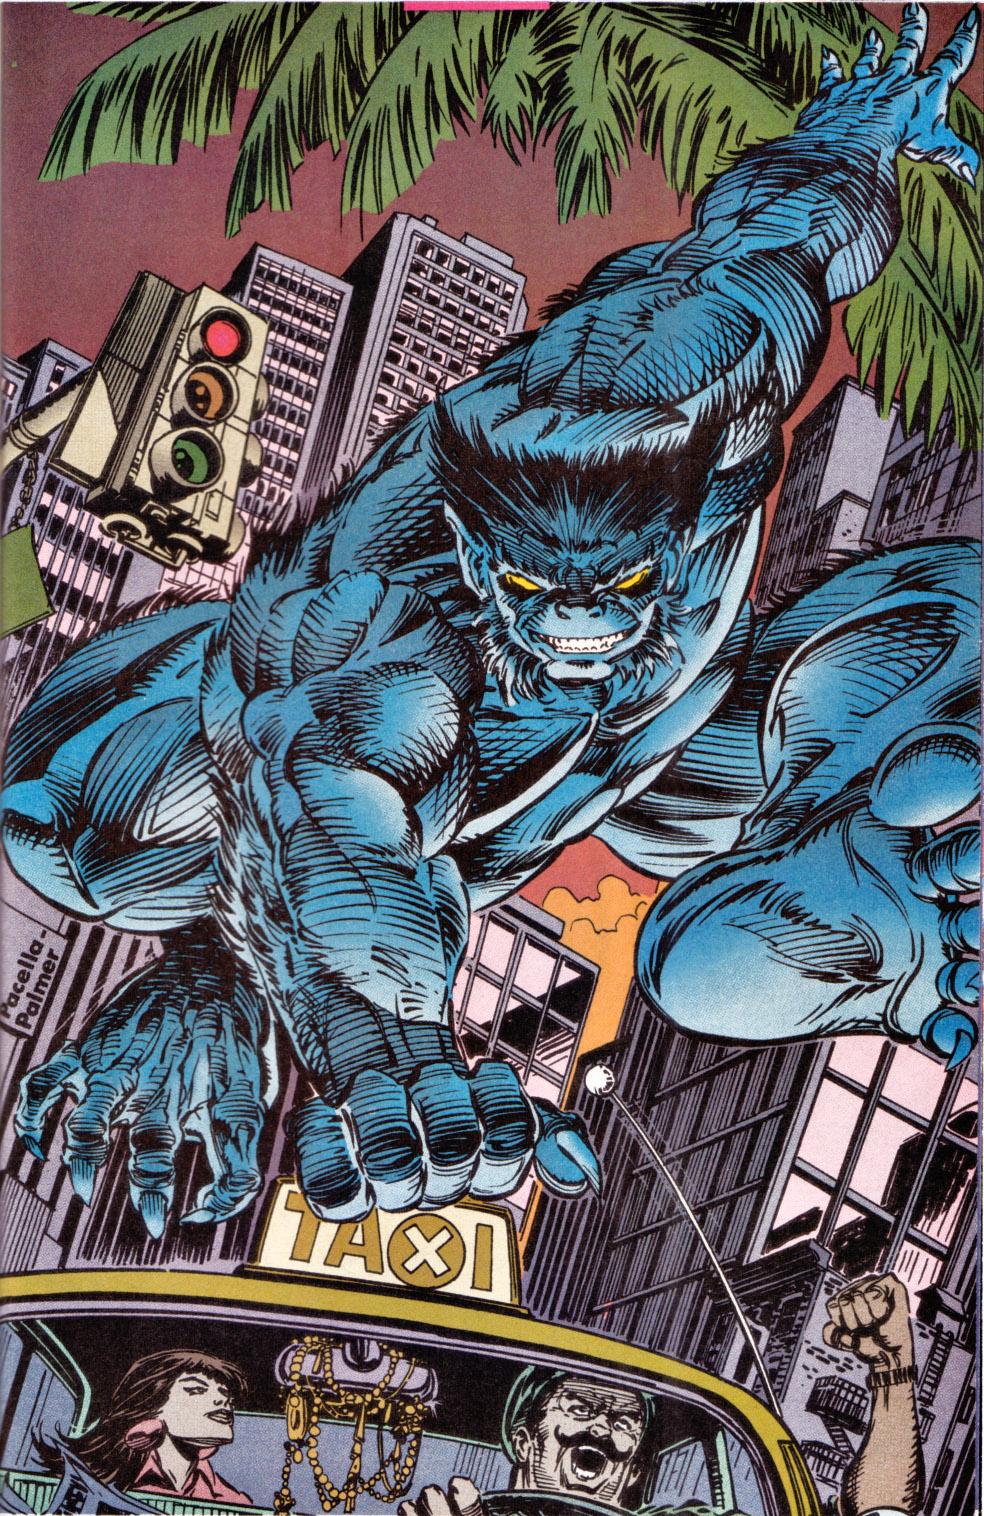 X-Men Annual Vol 2 3 Pinup 004.jpg